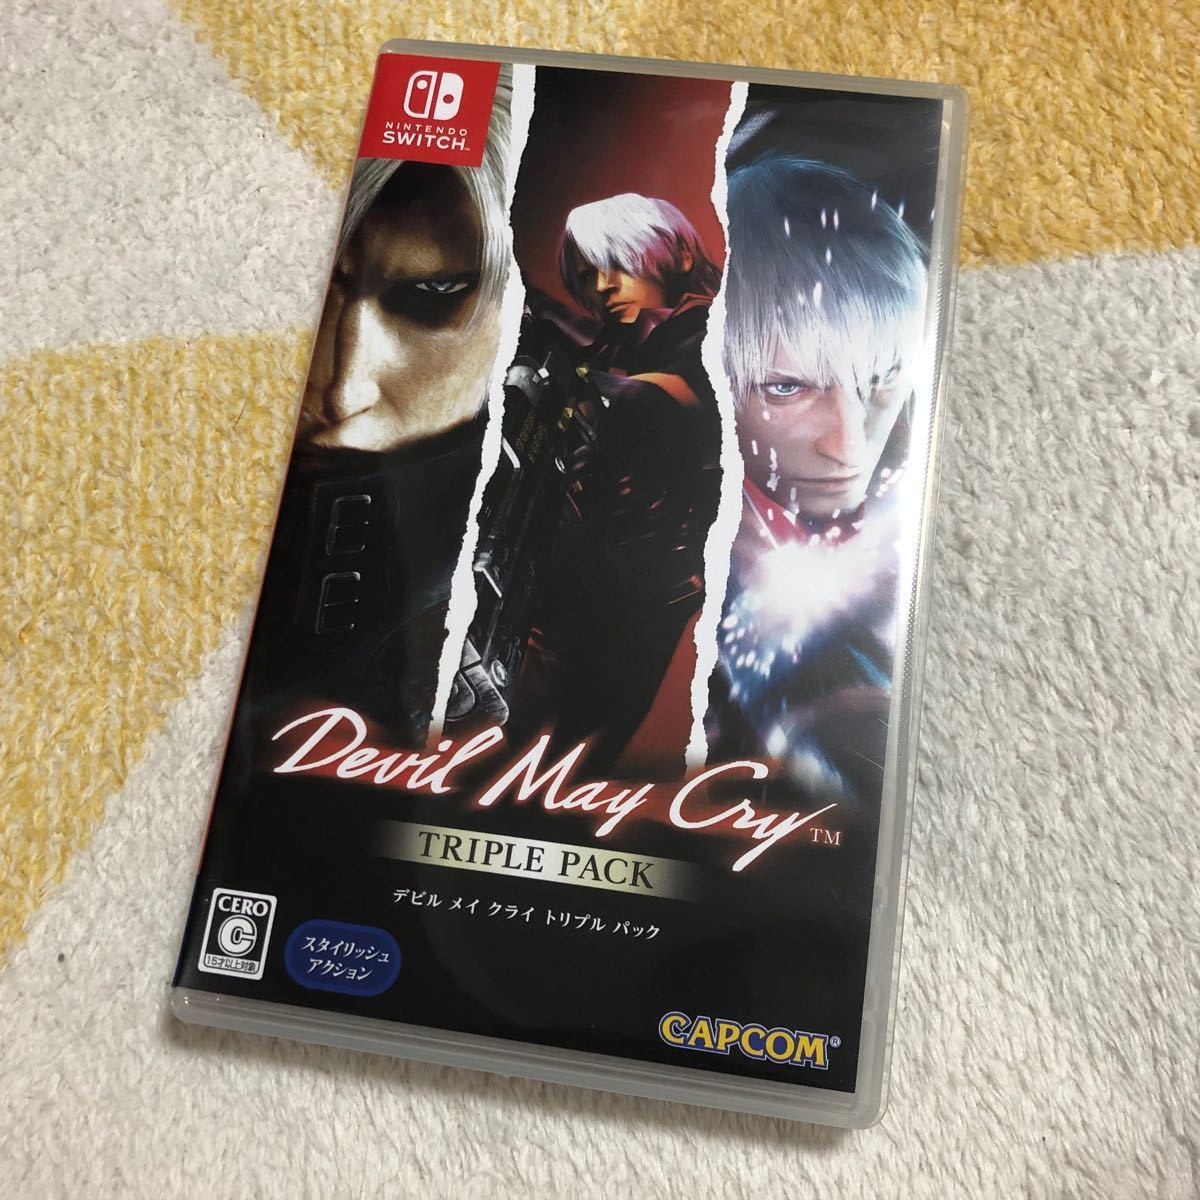 【Switch】 Devil May Cry デビルメイクライ トリプルパック(1のみ)